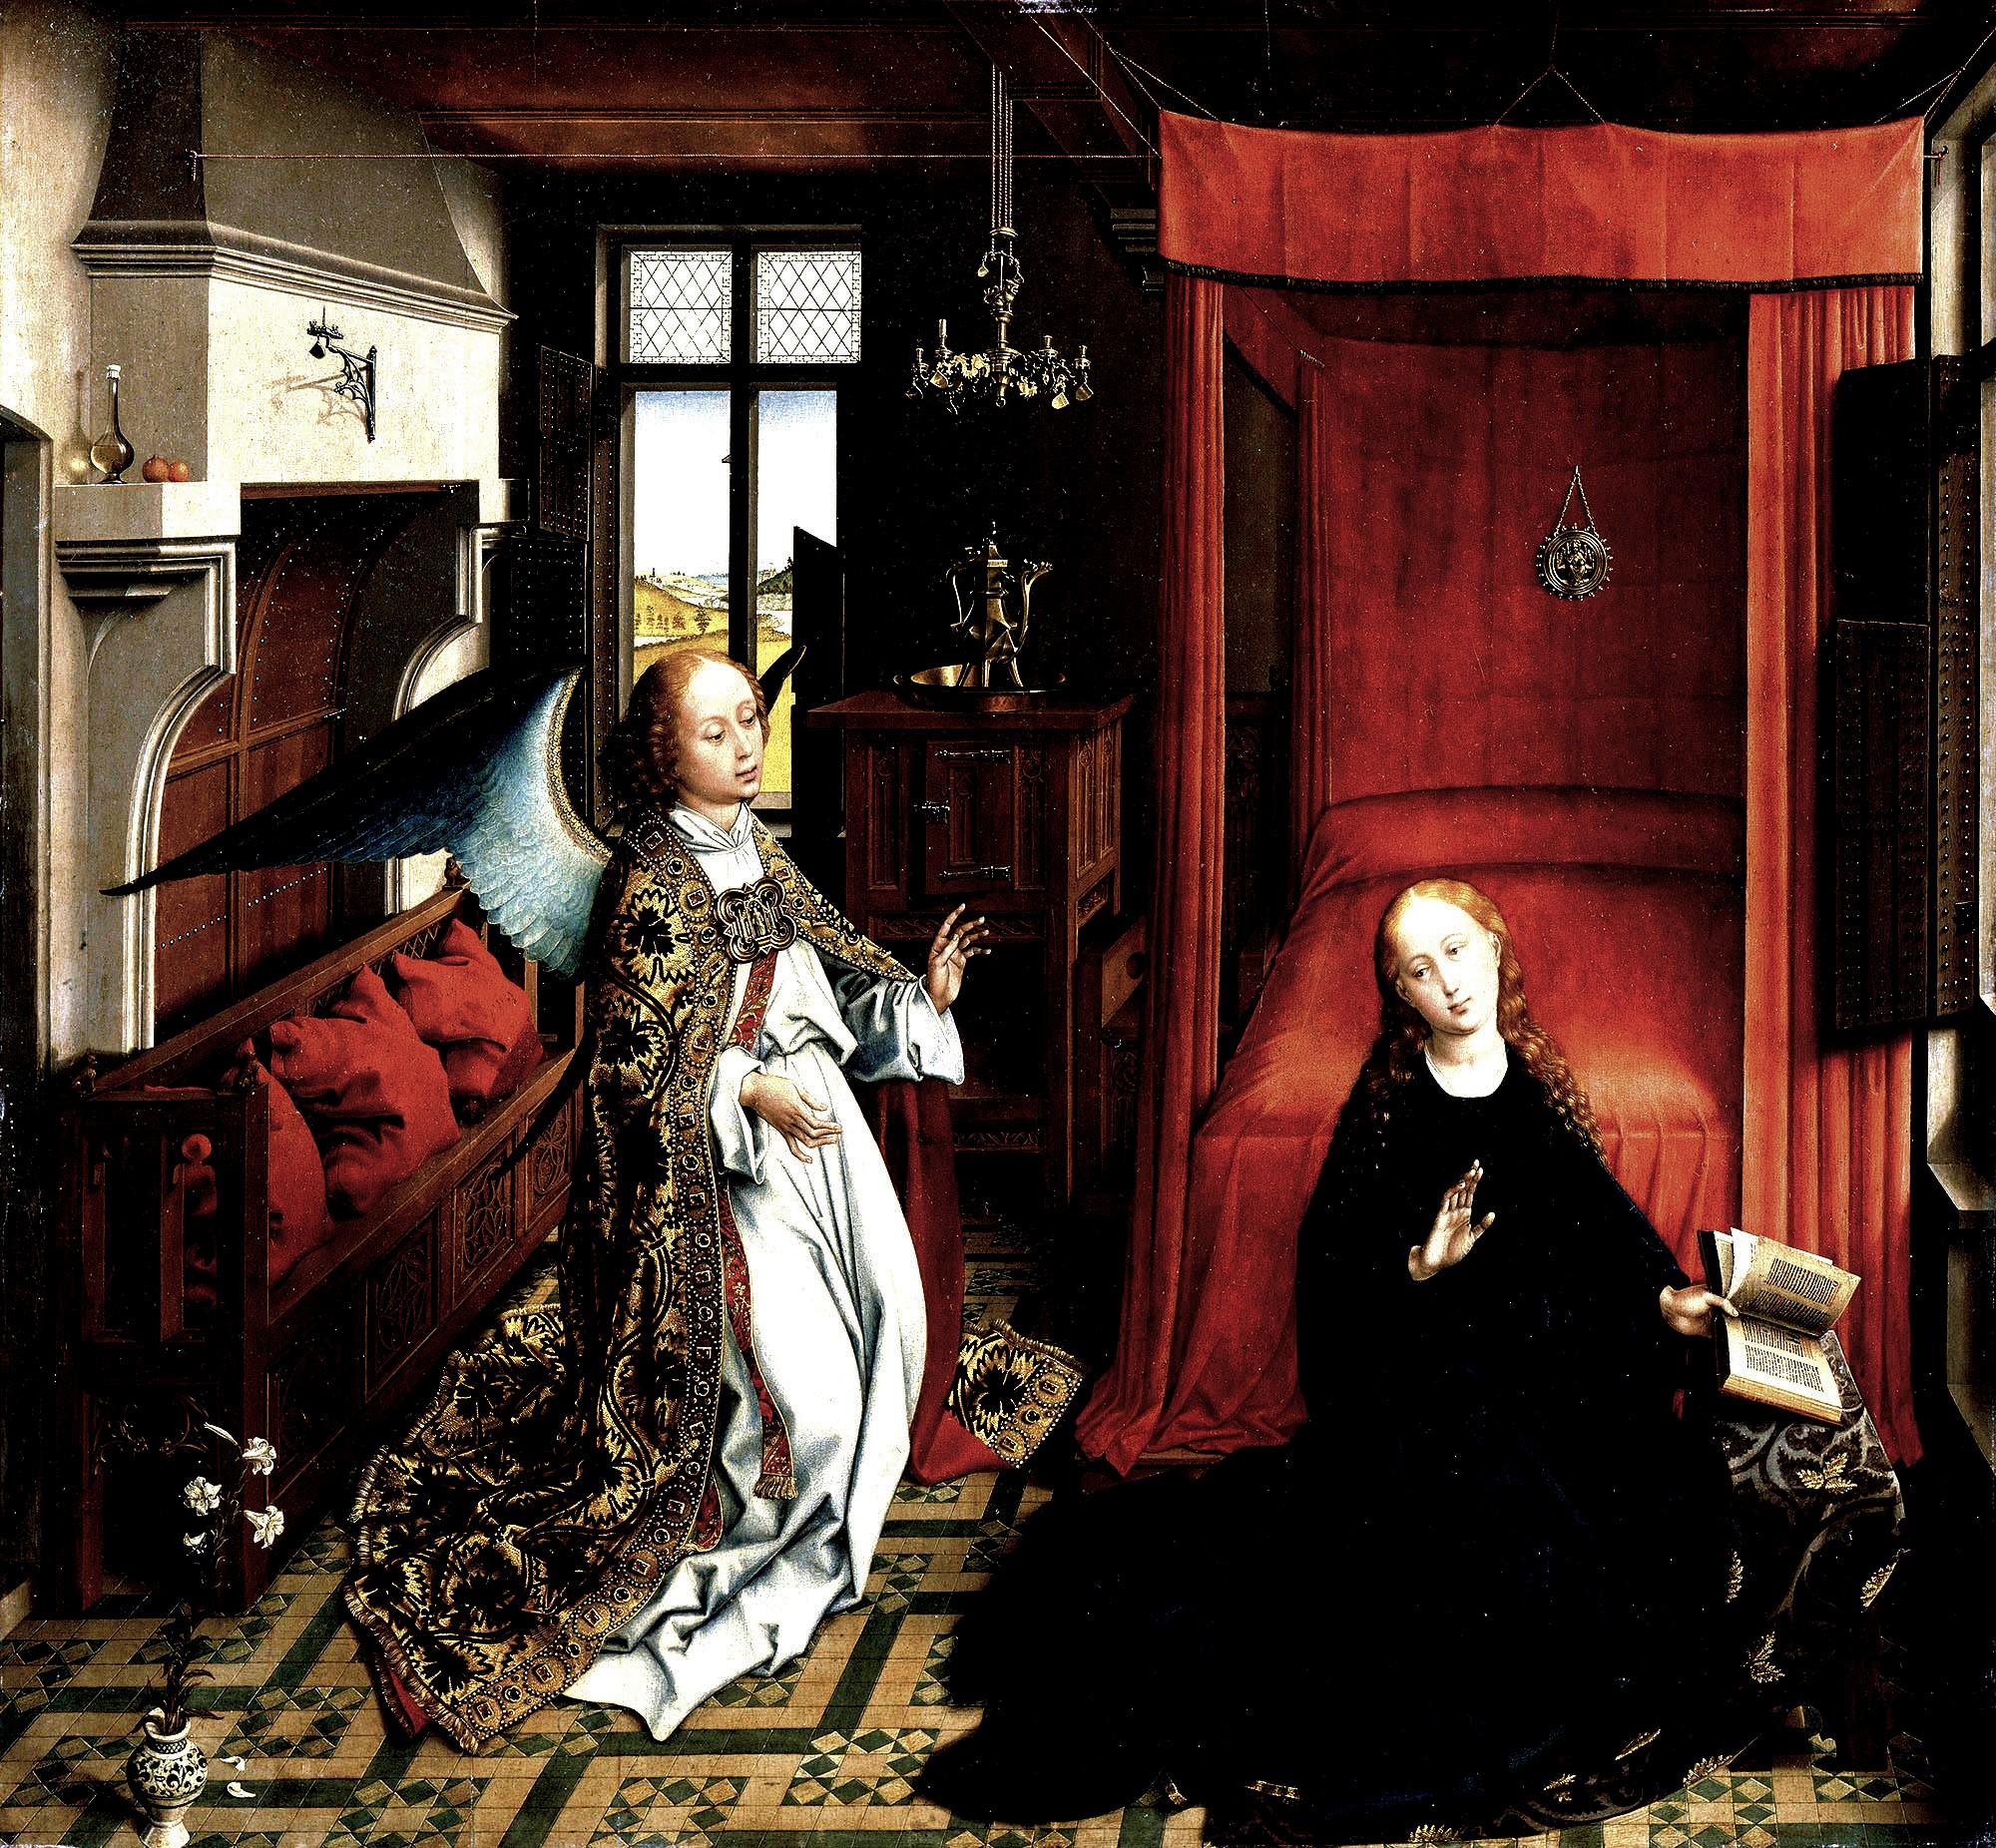 van der weyden 1434 ca annonciation Louvre contraste